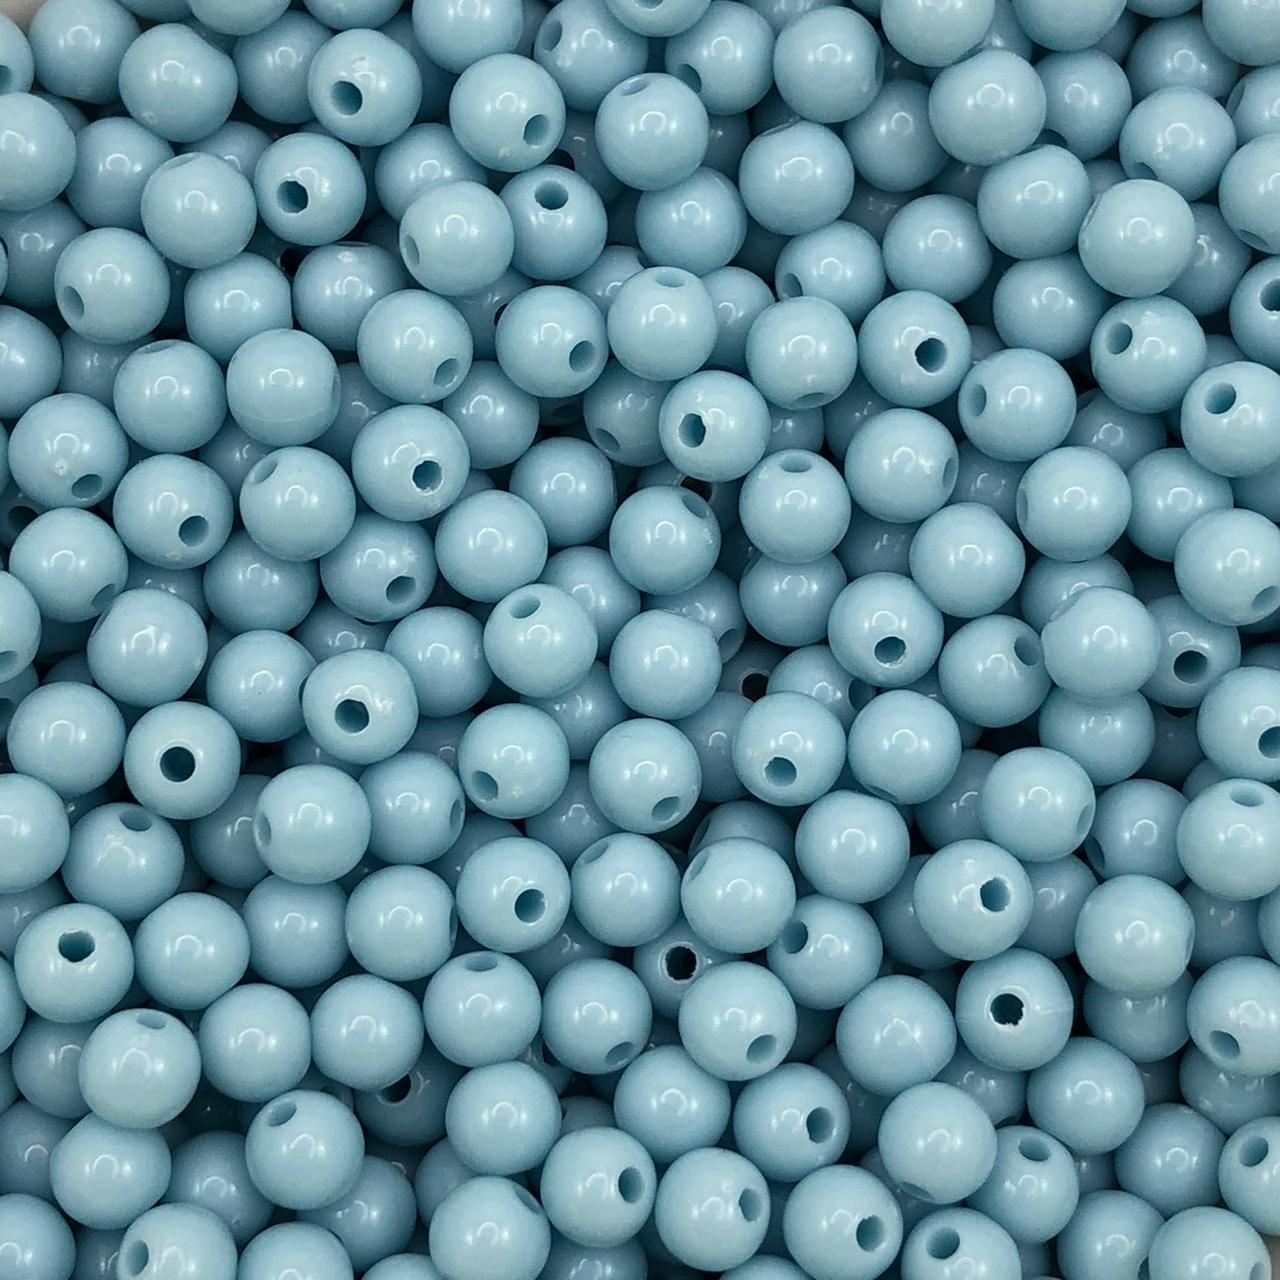 BOL566 - Bola Resina Azul Claro 6mm - 20Grs